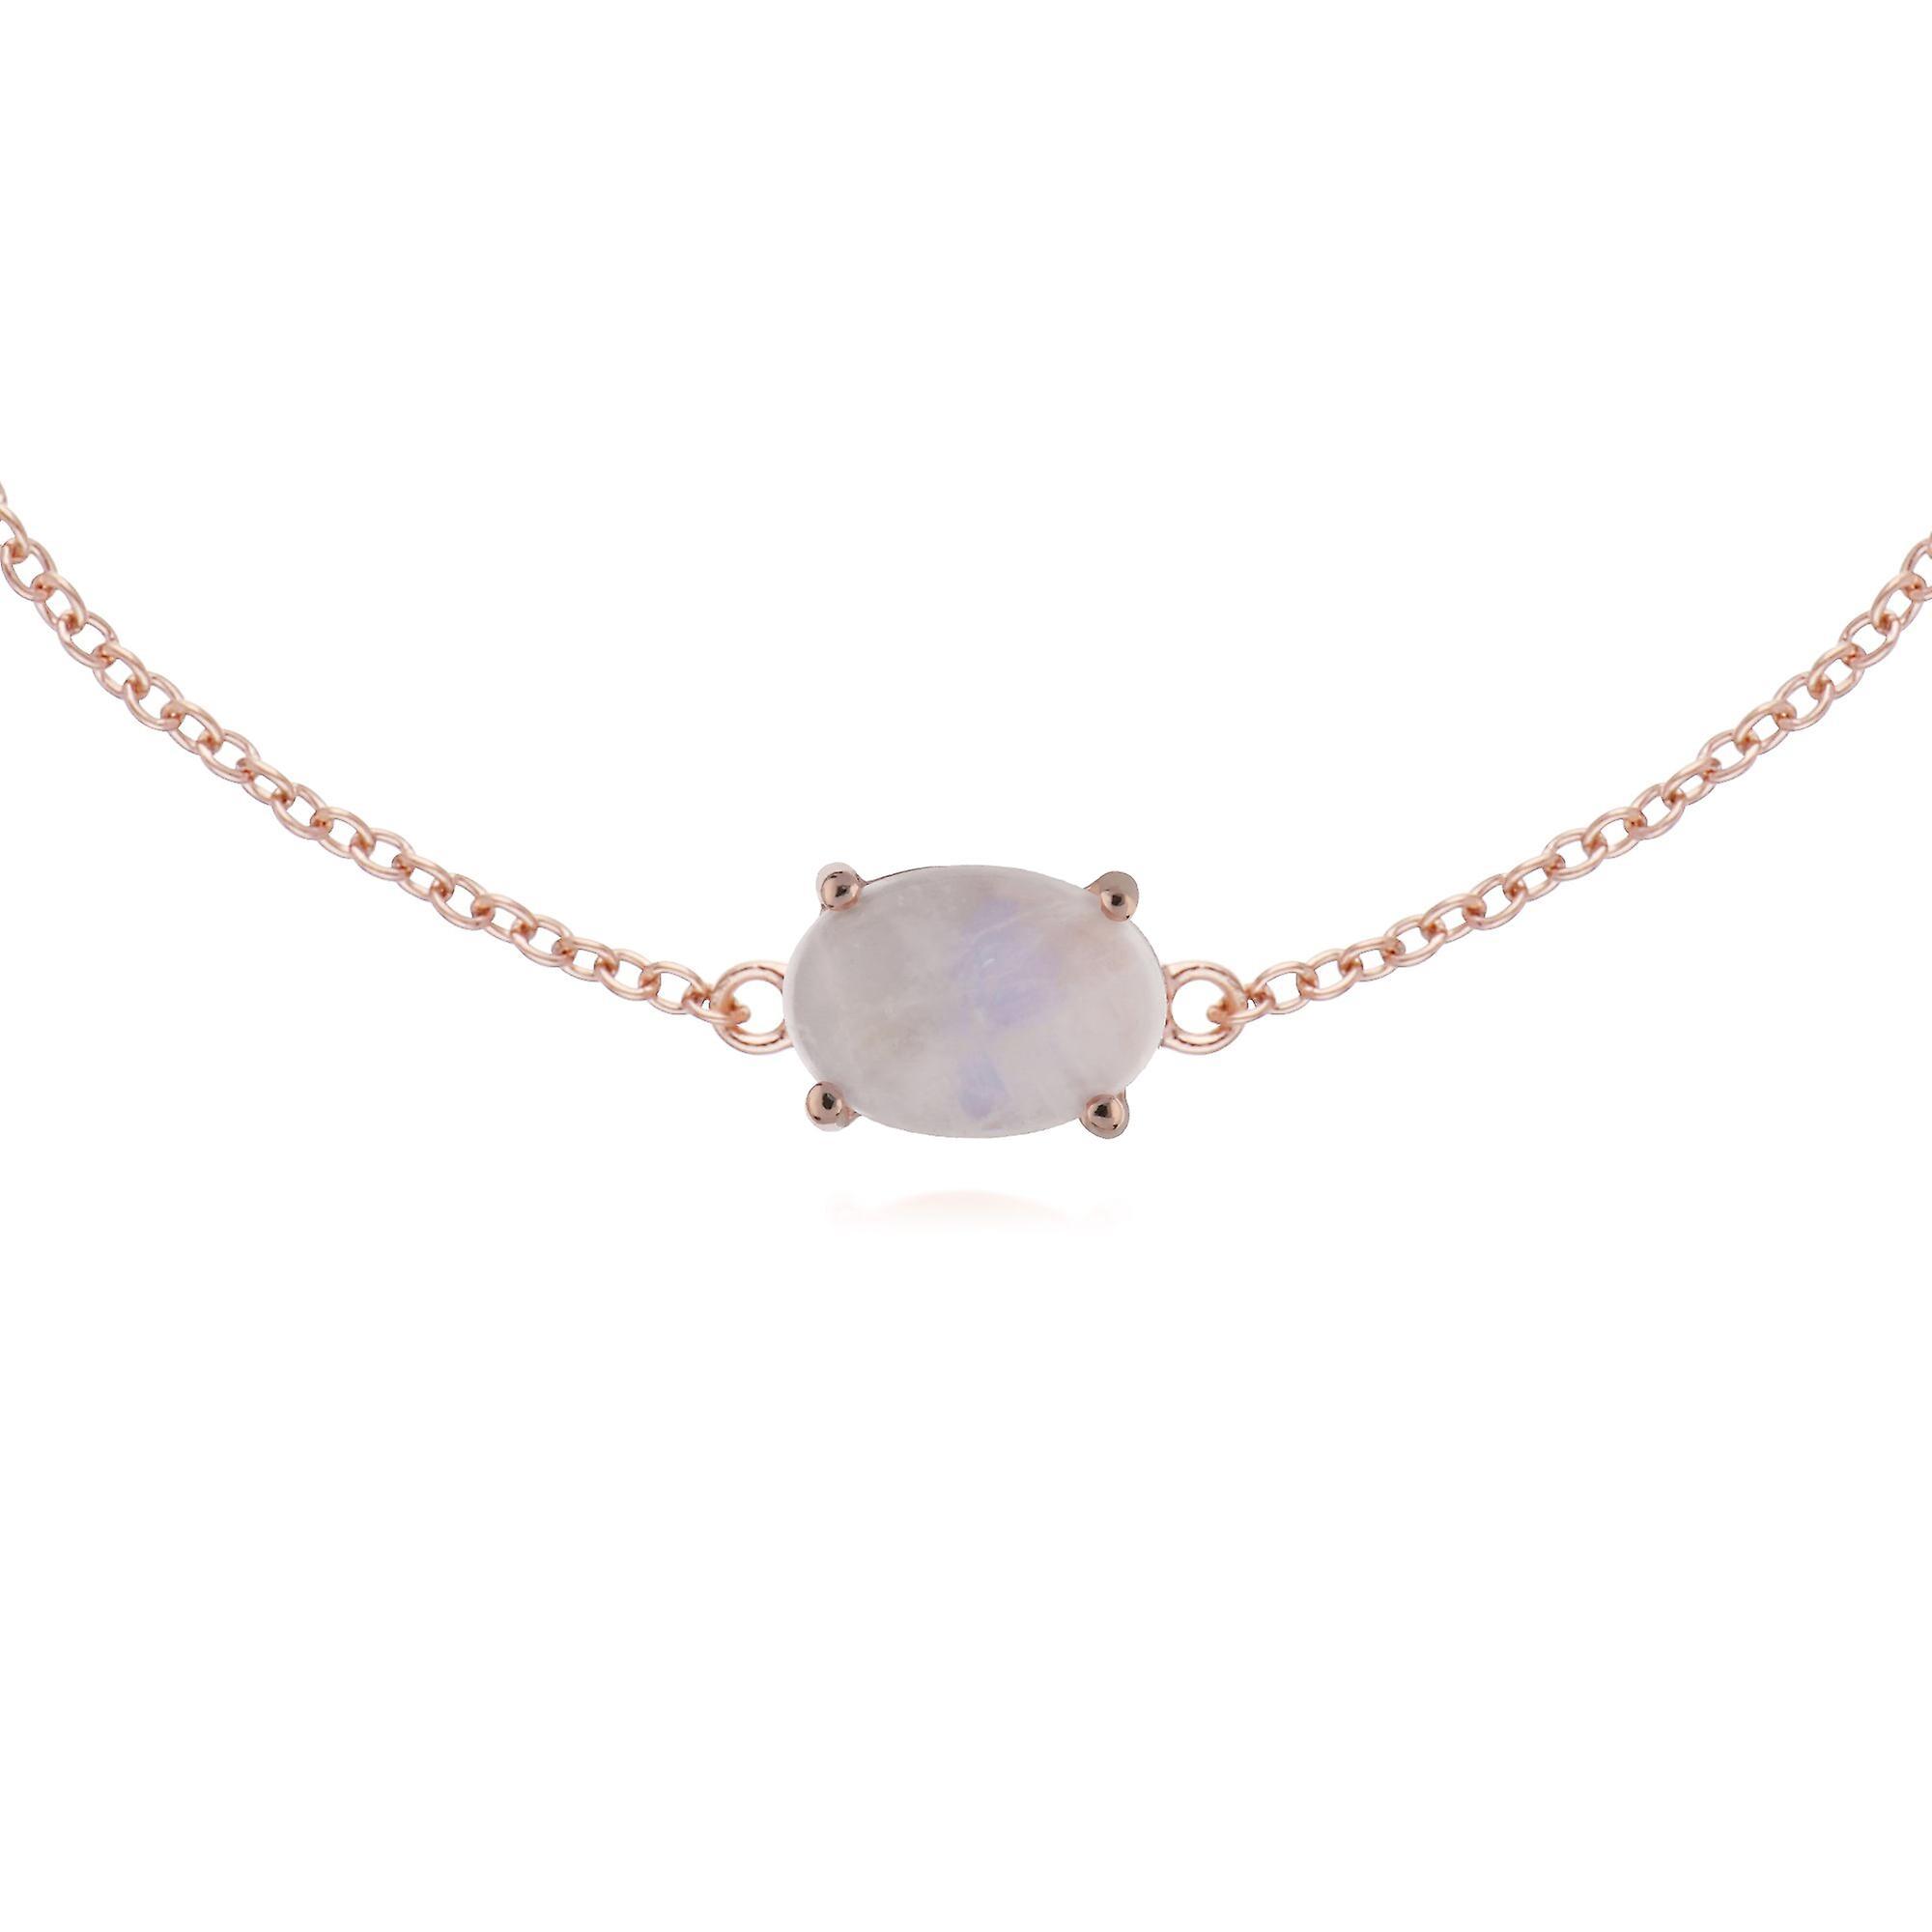 Gemondo Rose or Plated Sterling argent Rainbow Moonstone Oval 19cm Bracelet